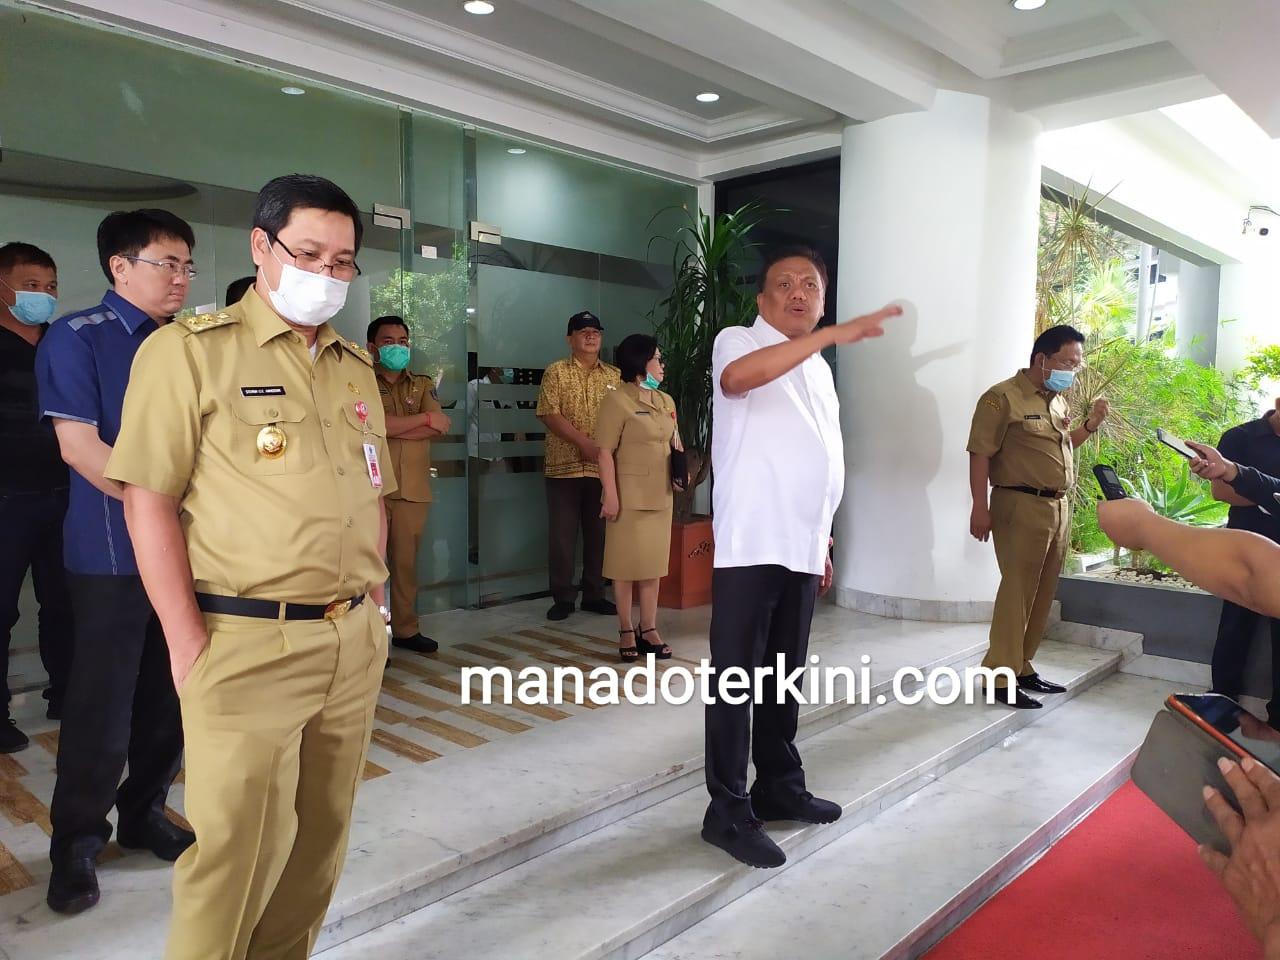 Permalink ke Siapkan 48.5 M, Pemprov Sulut Tindaklanjuti Arahan Jokowi Tangani COVID-19